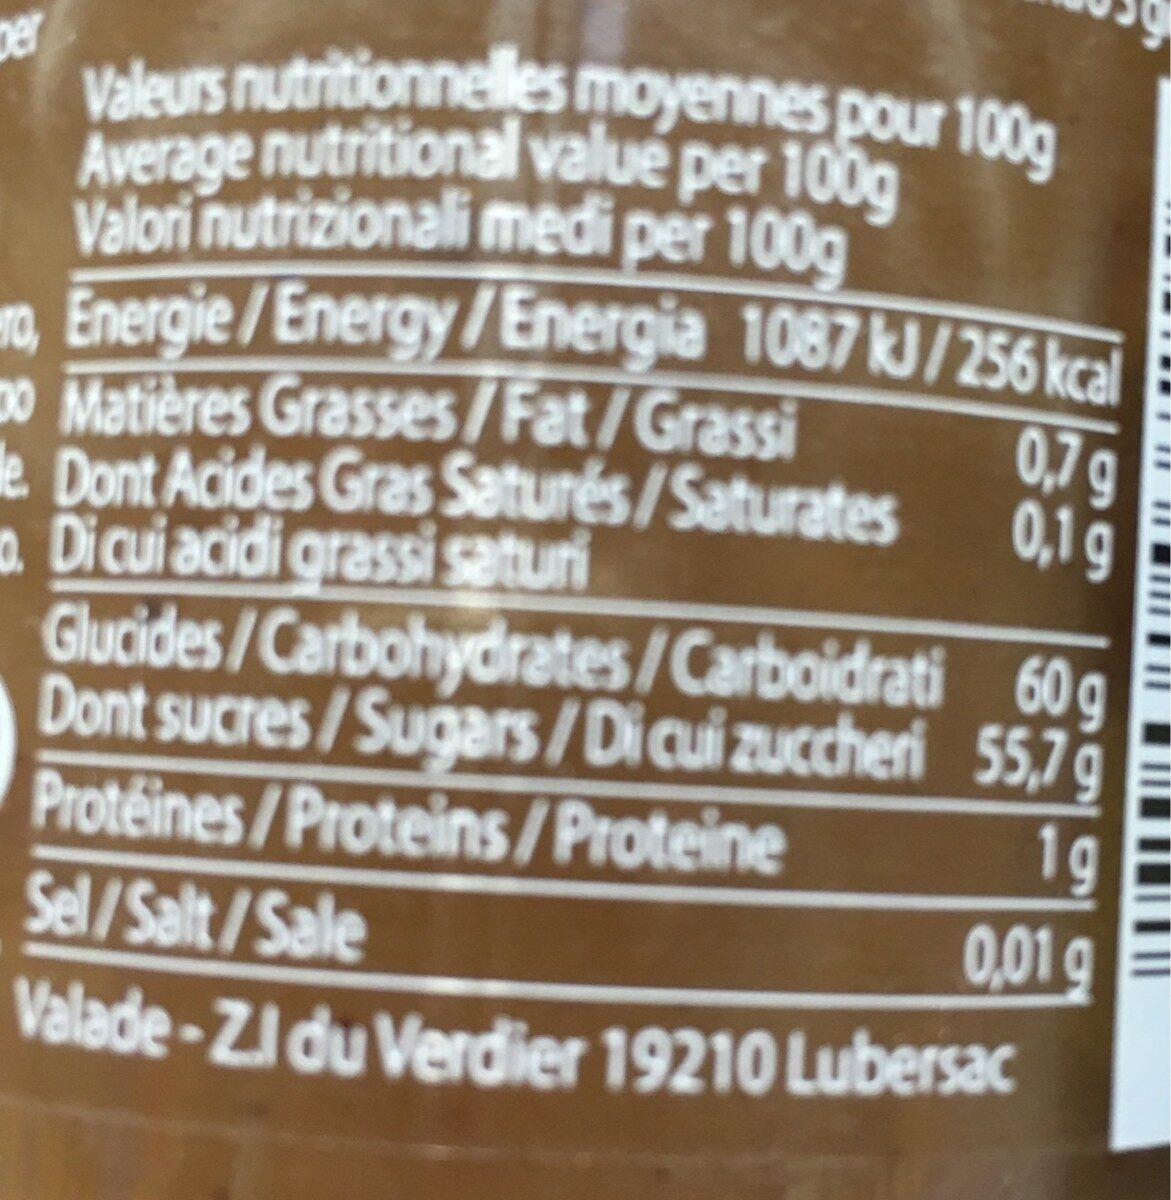 Crême de marrons au caramel - Voedingswaarden - fr